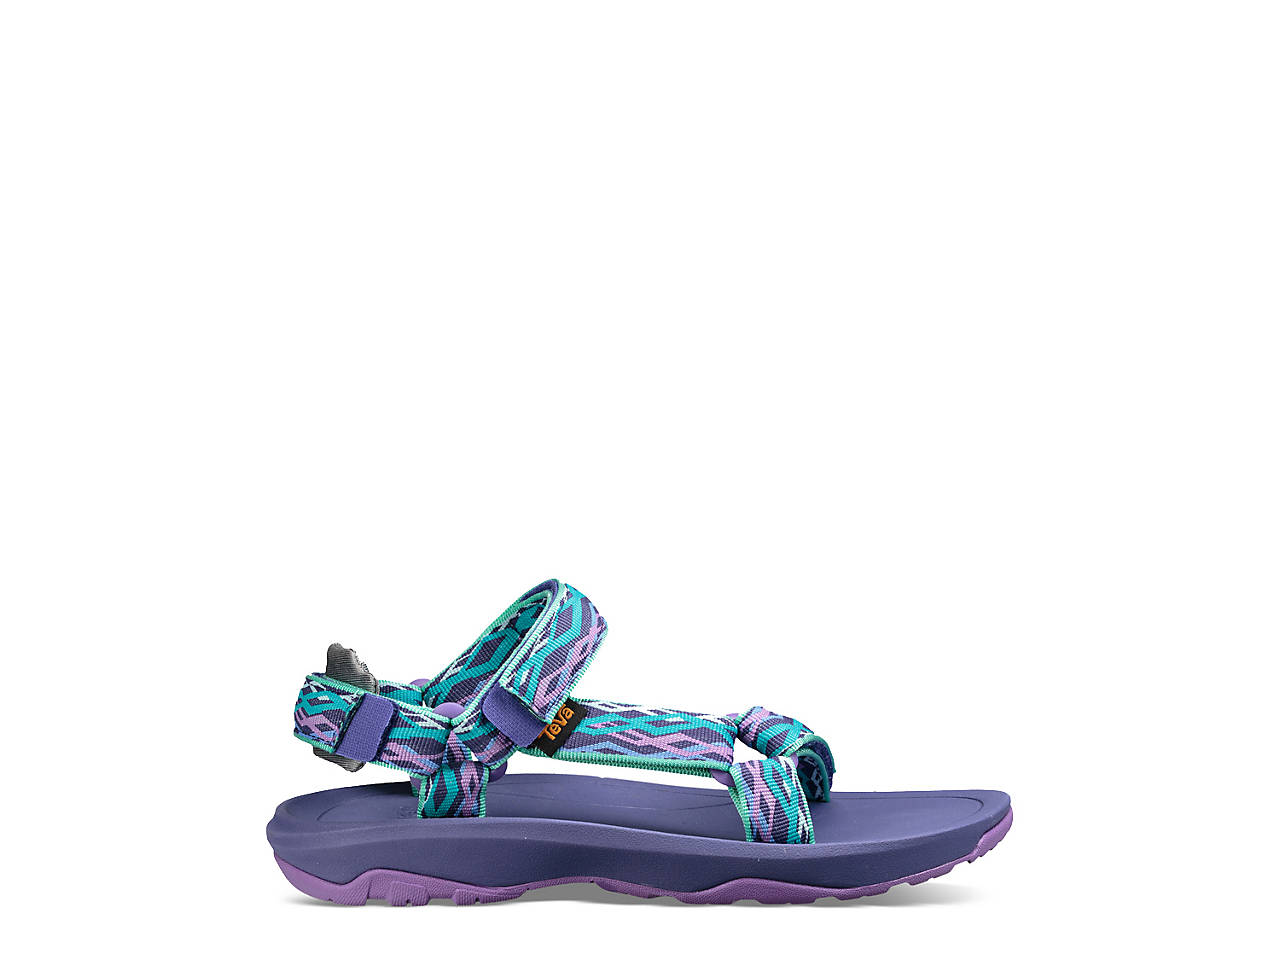 4d8611a686822 Teva Hurricane XLT 2 Infant   Toddler Sandal Kids Shoes